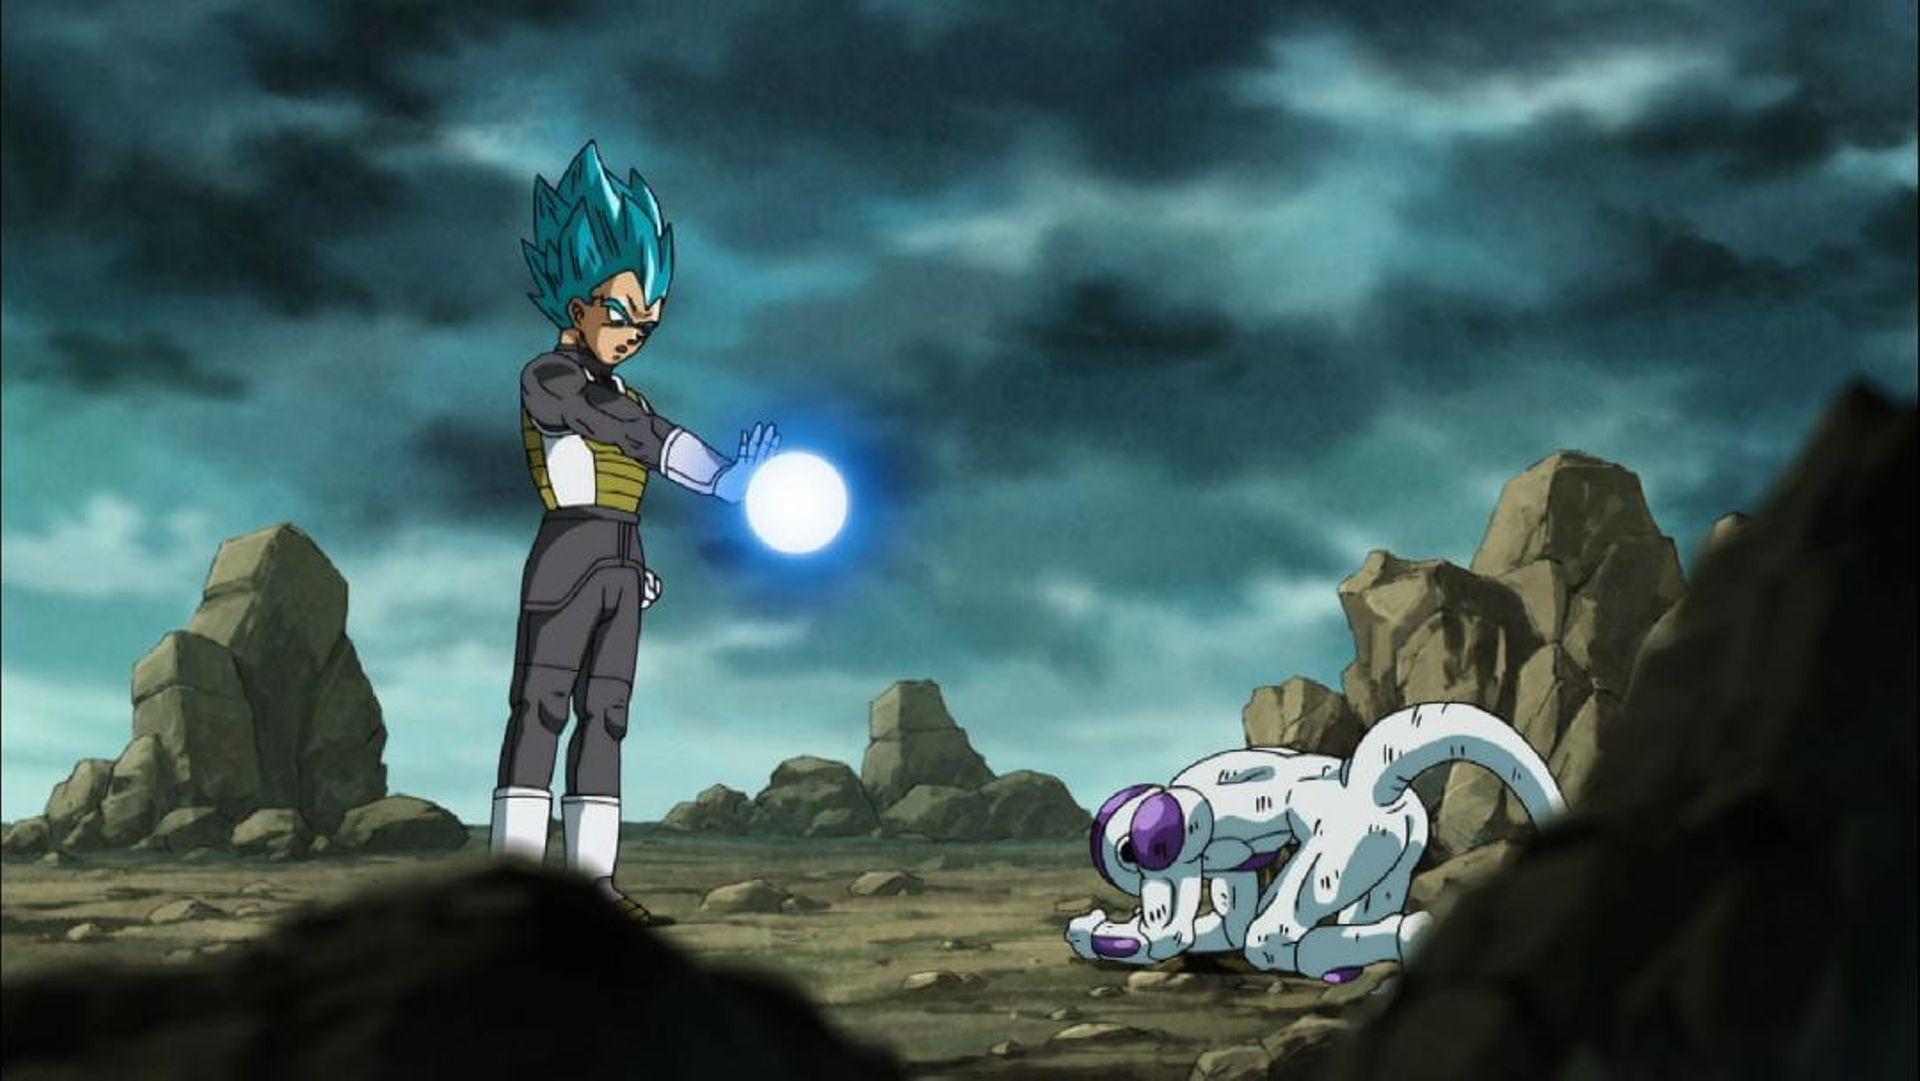 Dragon Ball Super - You're Our Tenth Warrior! Goku